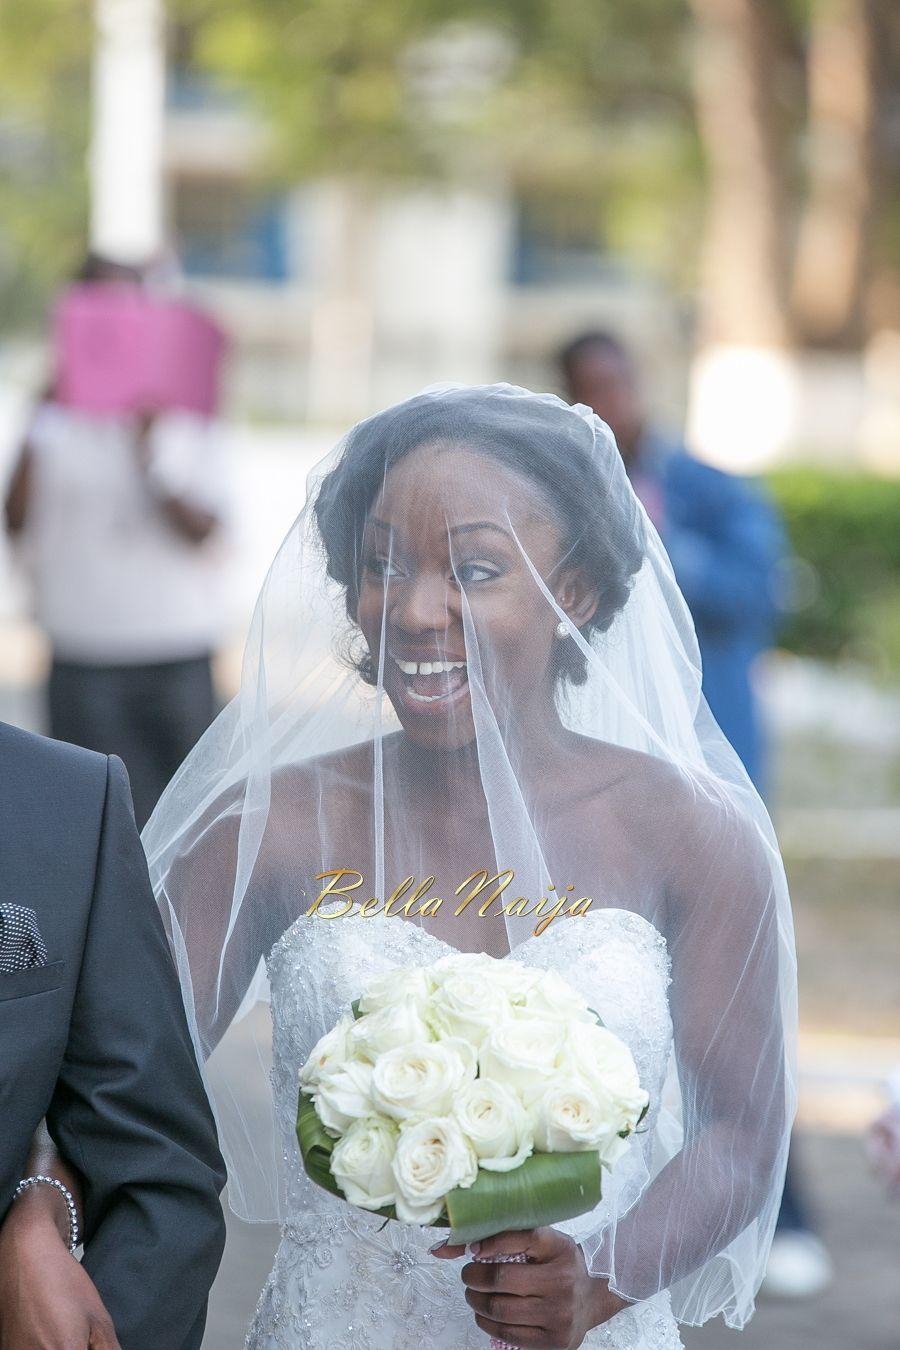 Wedding decorations ghana  Ghanaian Bride looking amazing l Her Big Day  AYIKUMAH I